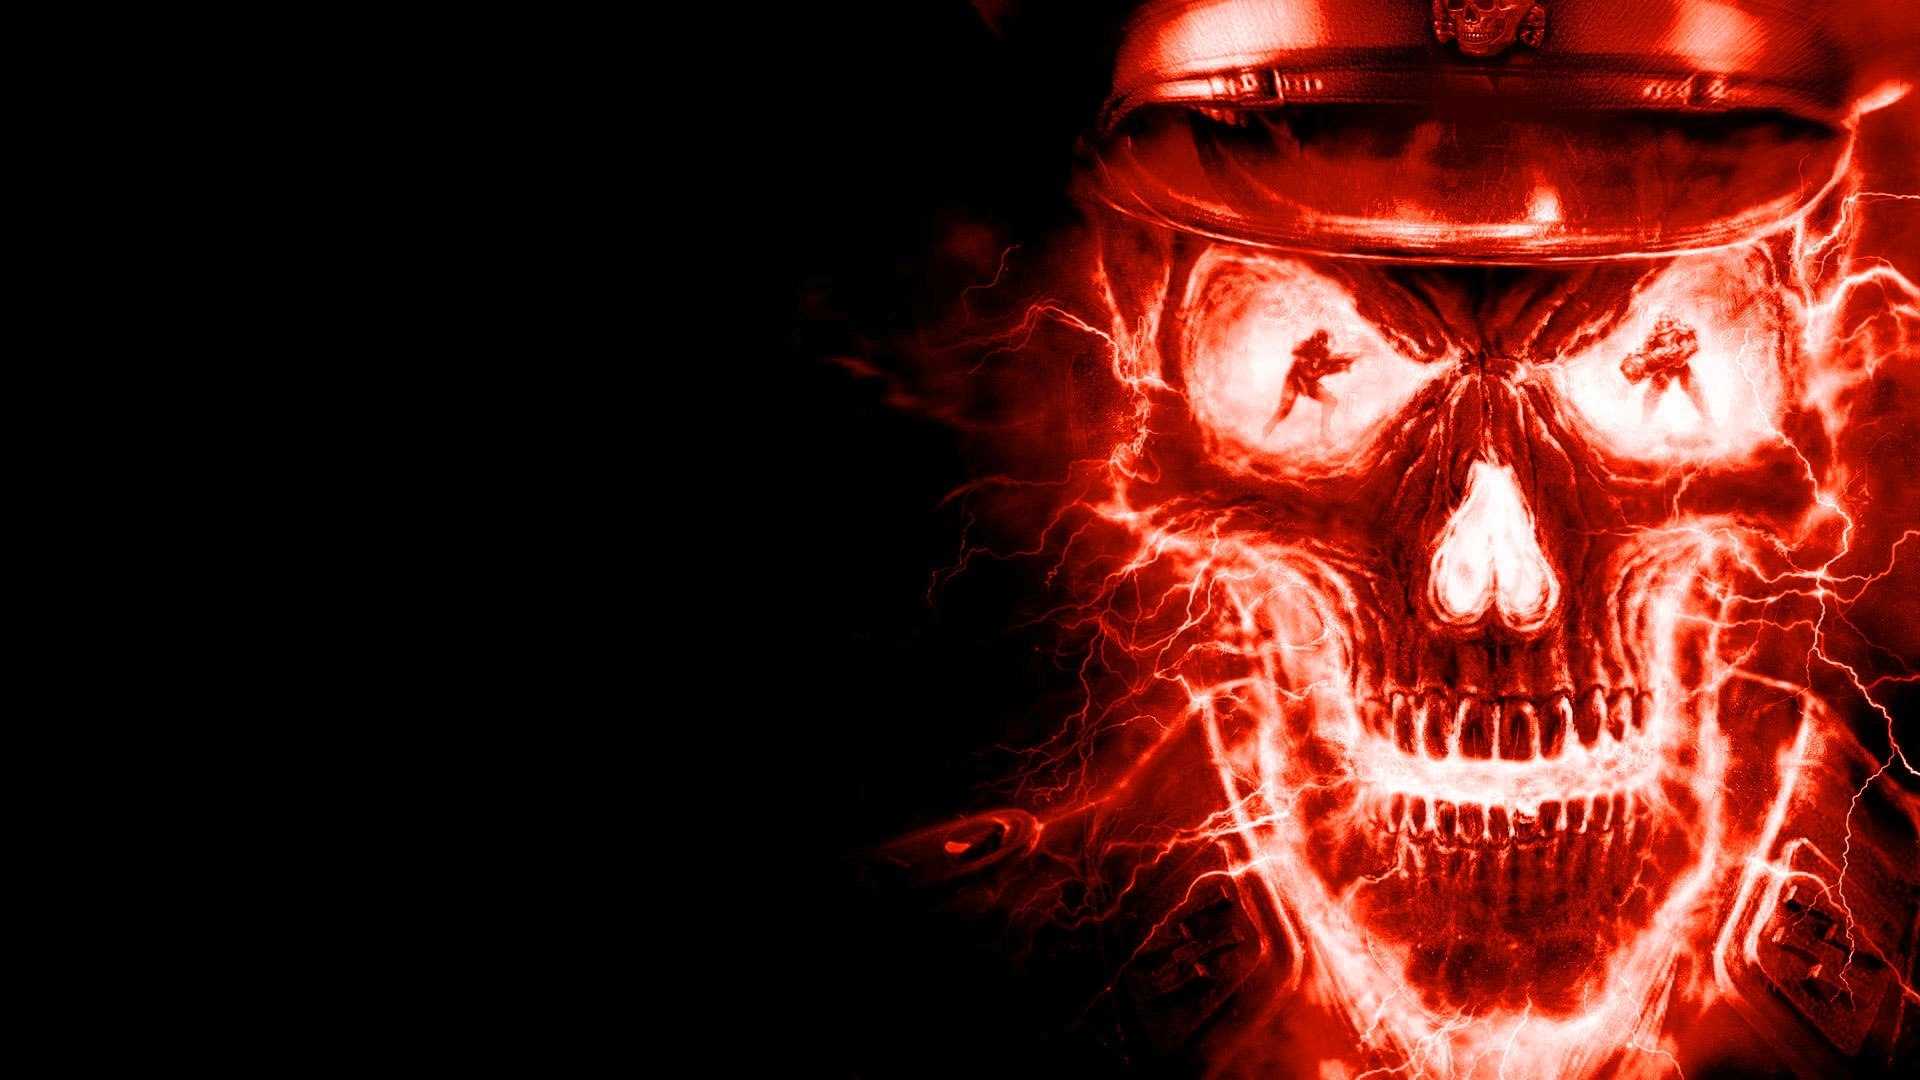 Fire-Skull-Free-Download-High-1920x1080PX-Music-Skull-wallpaper-wp3405546